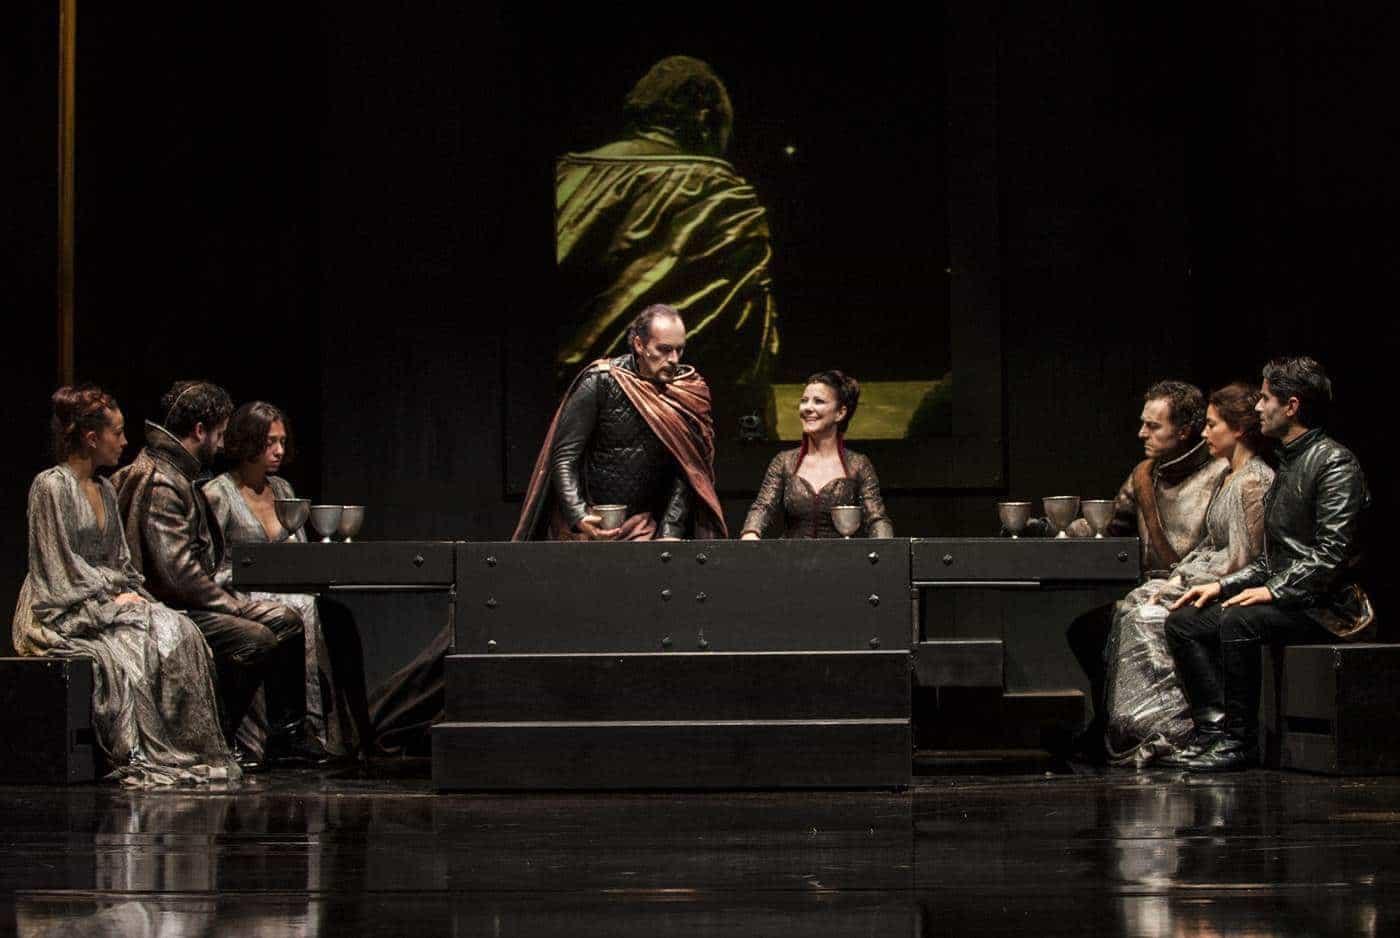 Macbeth regia Luca De Fusco foto fabio donato